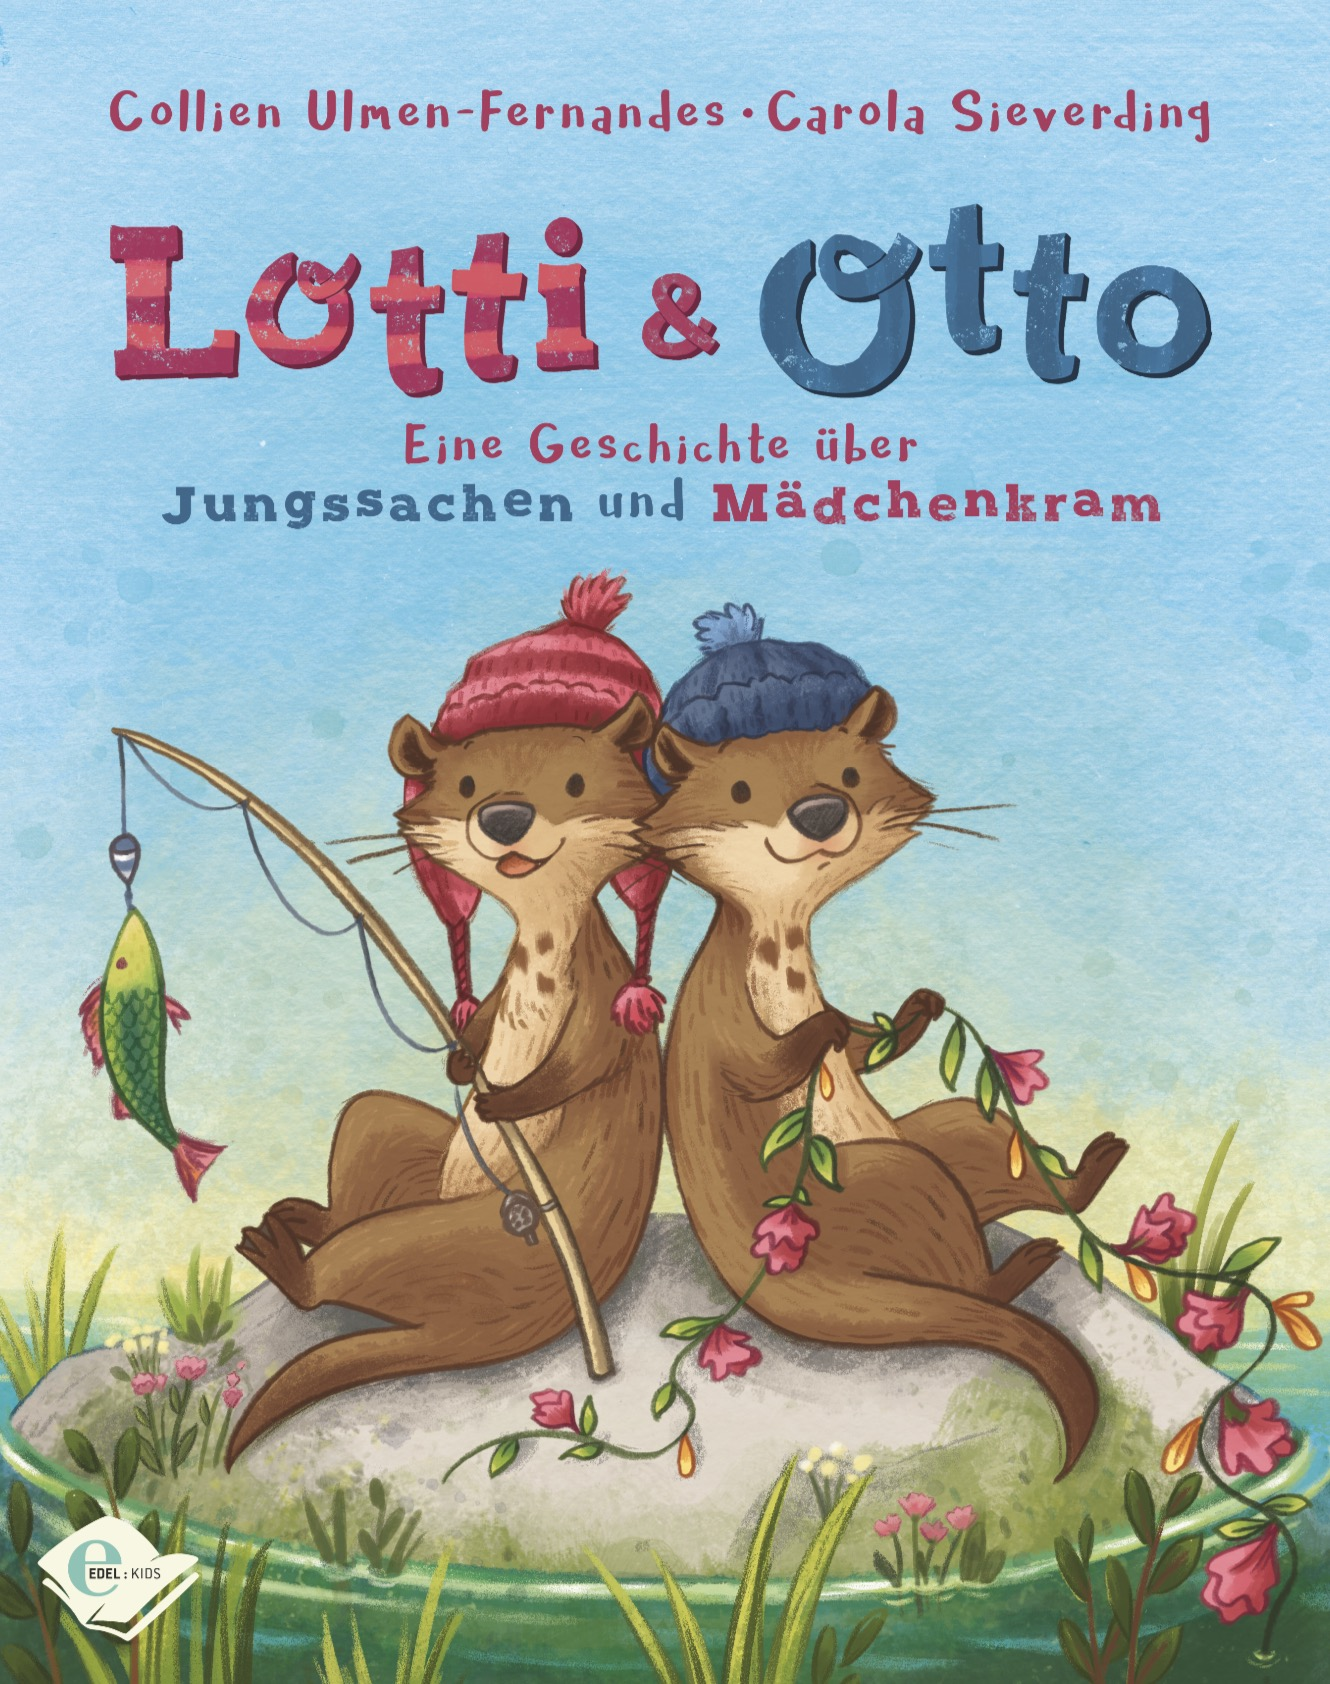 Mädelsschnack l Collien Ulmen-Fernandes Kinderbuch